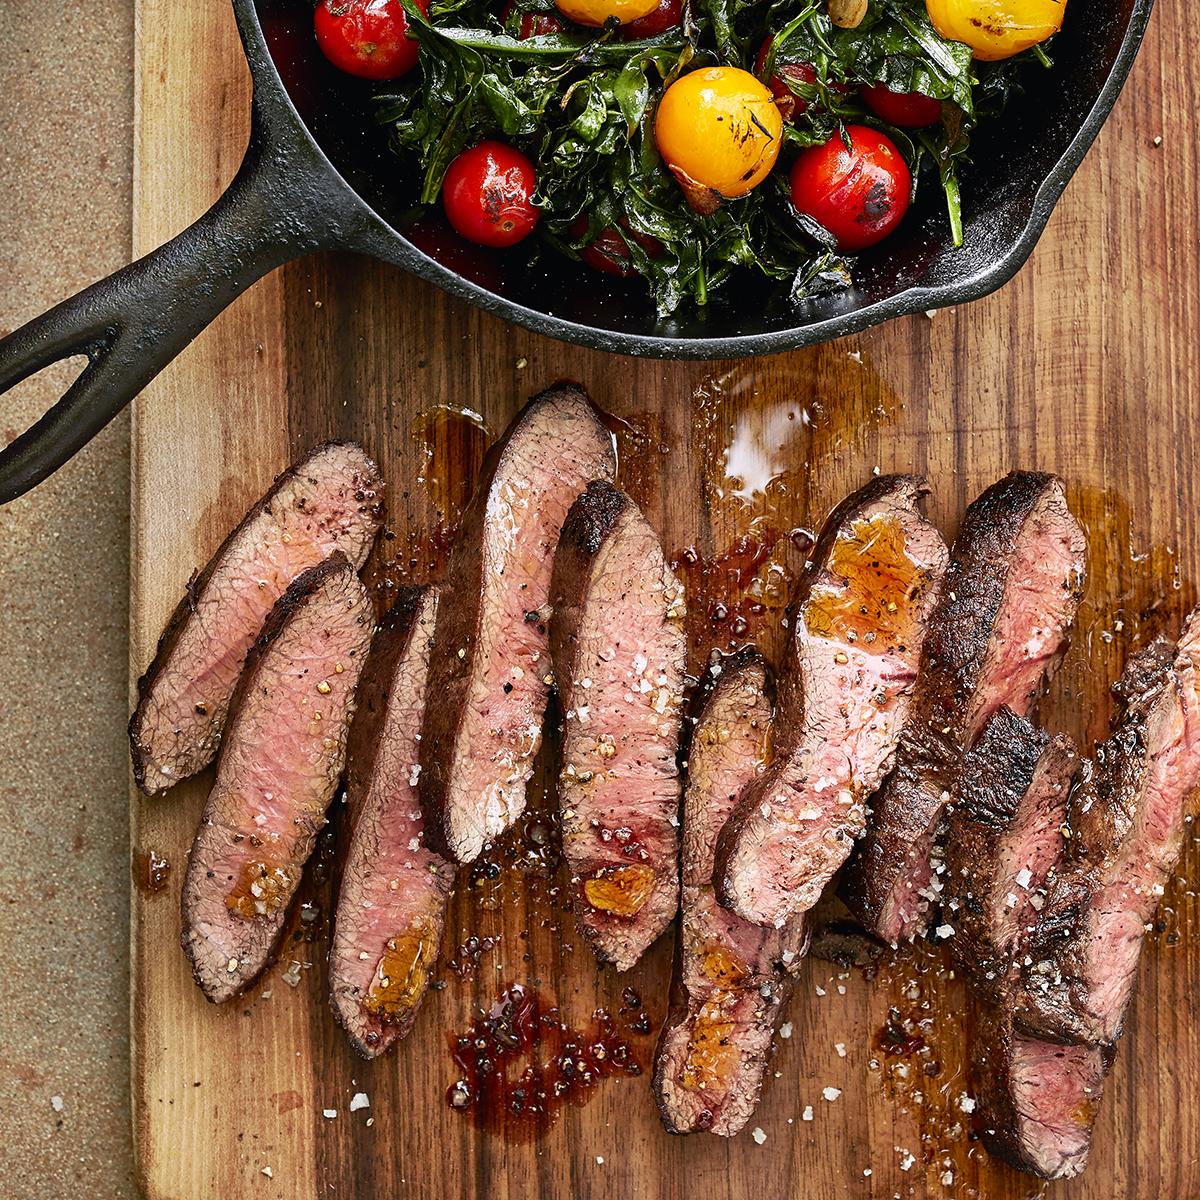 Flat Iron Steak with Cherry Tomatoes